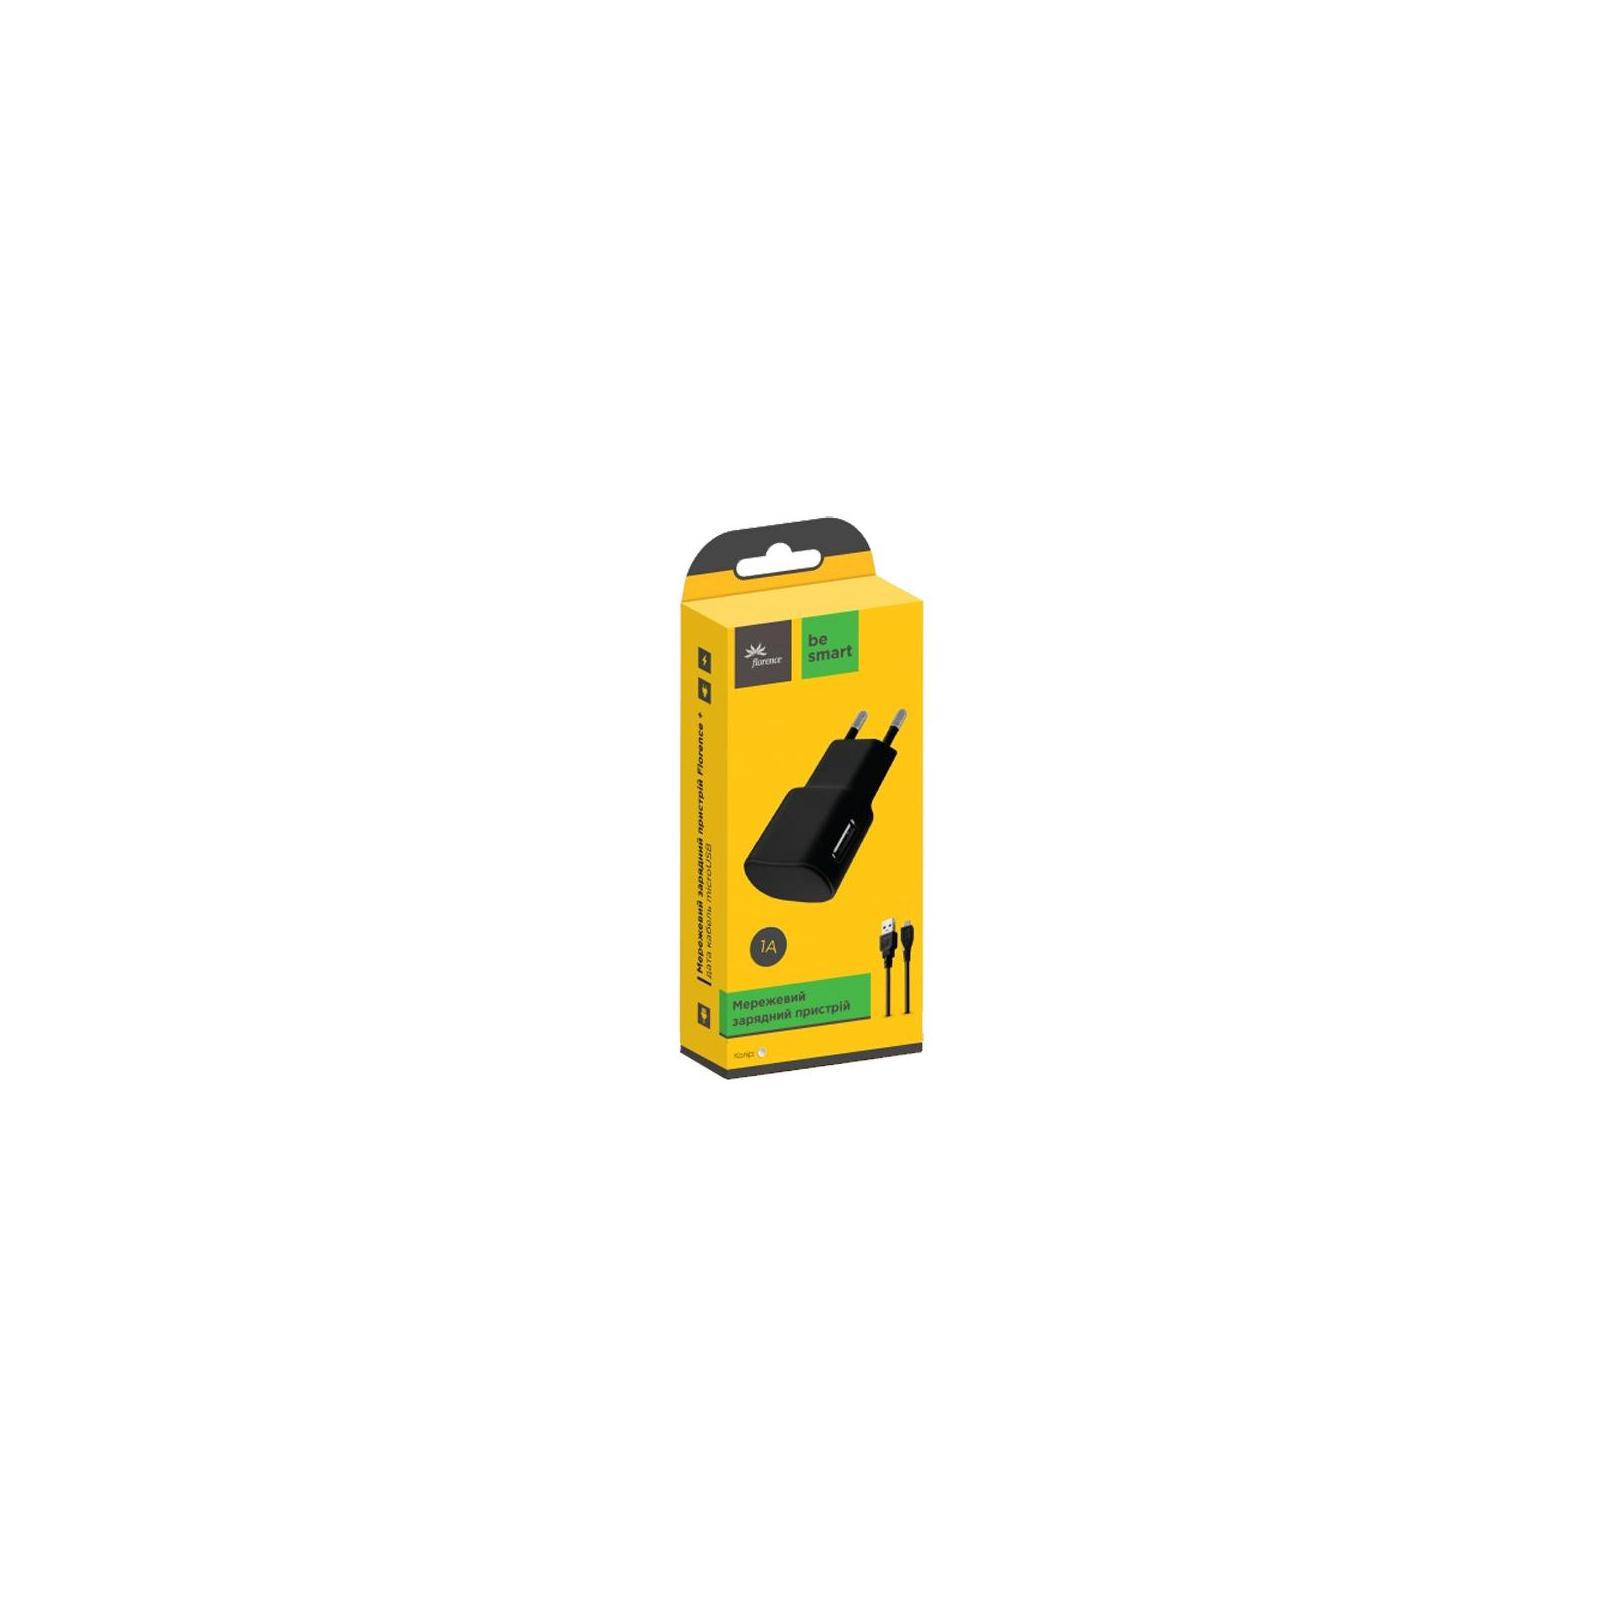 Зарядное устройство Florence USB, 1.0A + cable microUSB white (FW-1U010W-M) изображение 2